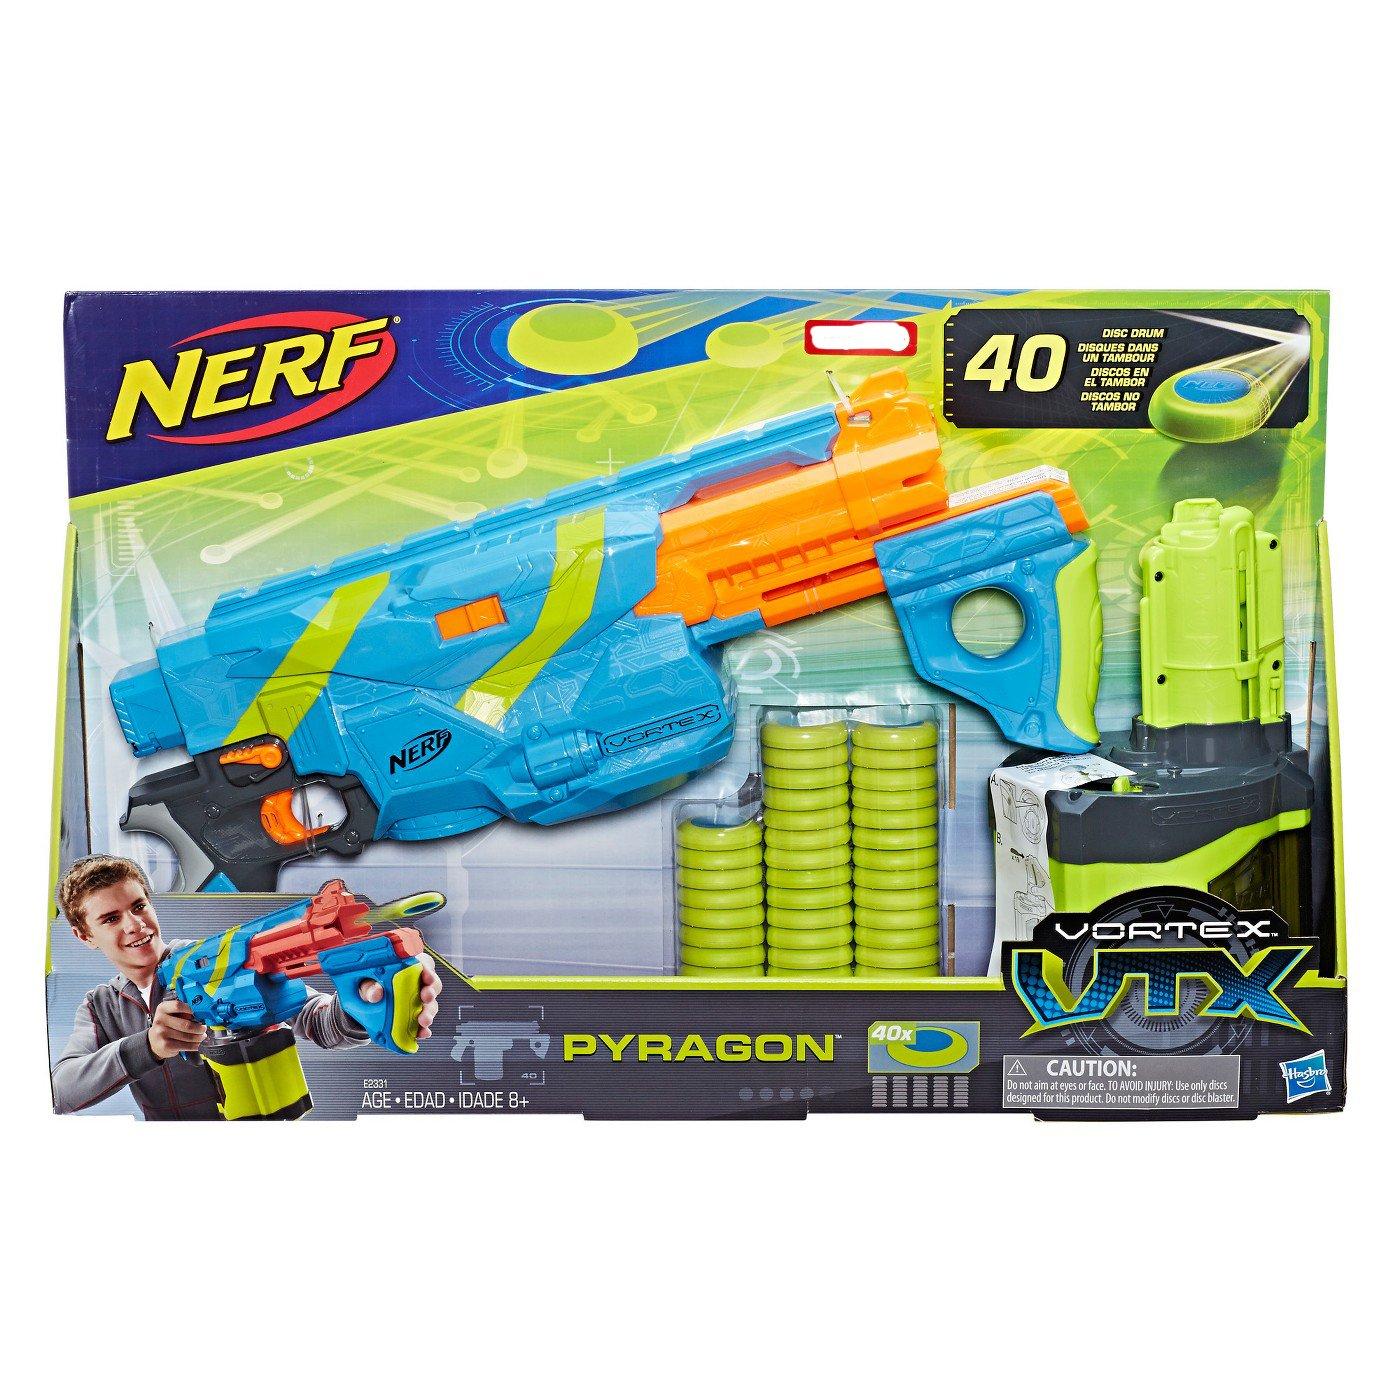 NERF Vortex VTX Pyragon ナーフボルテックス VTX ピラゴン [並行輸入品] B07D6GWMP7